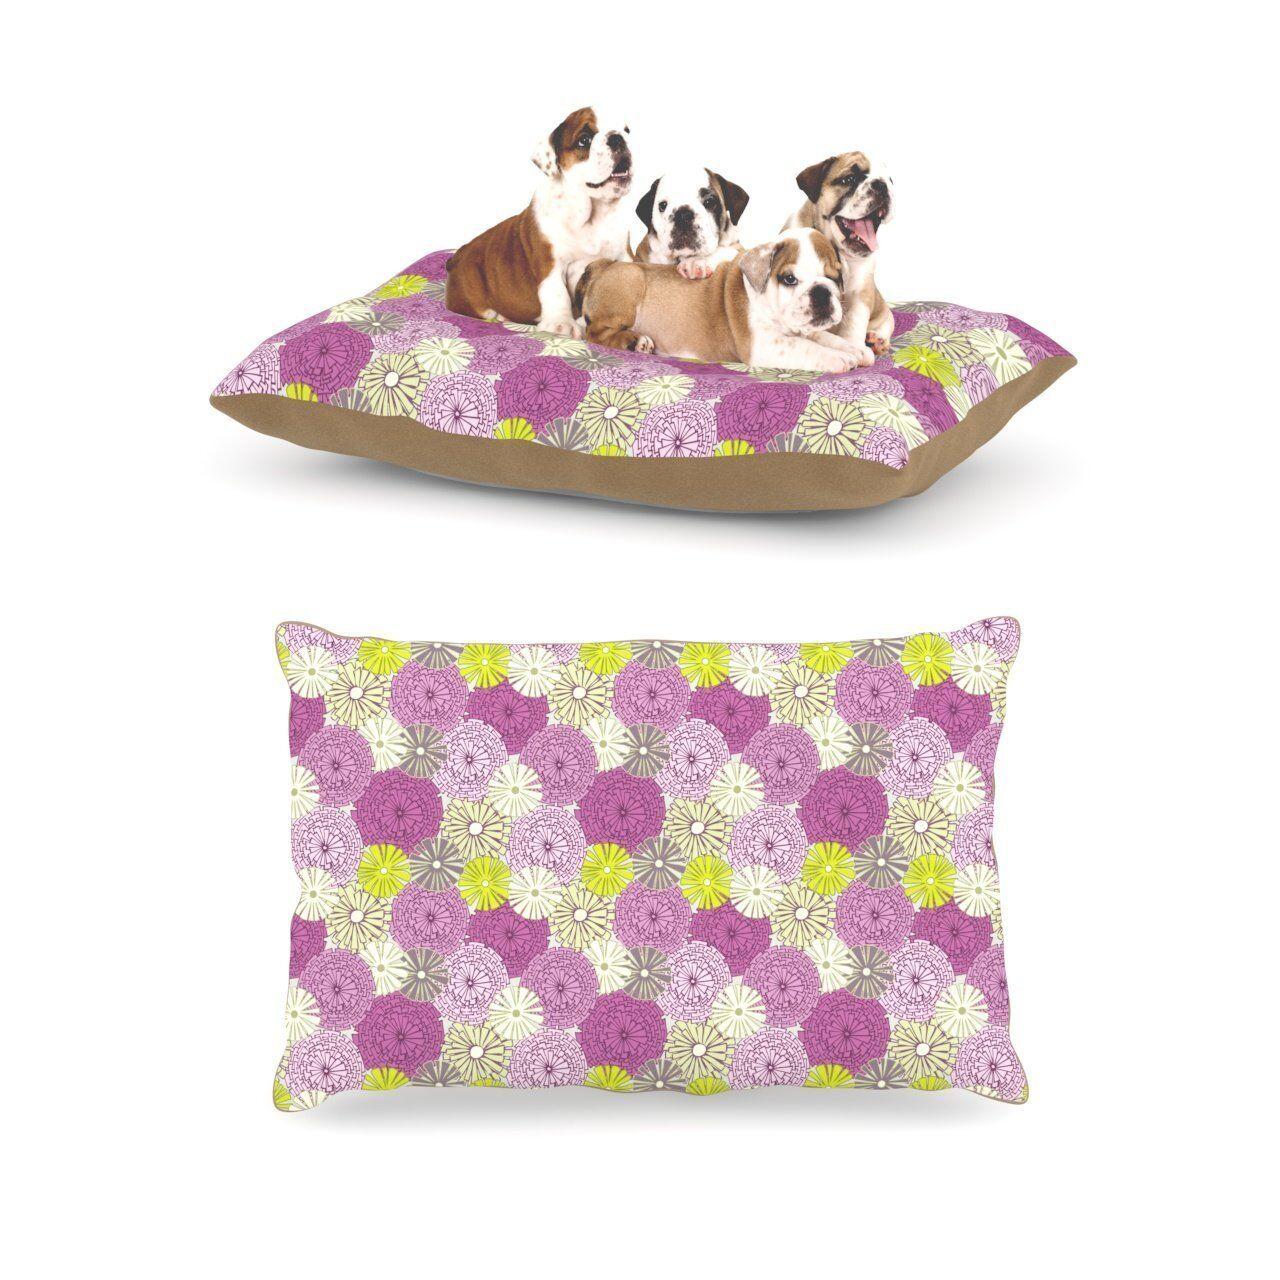 Kess InHouse Julie Hamilton Rhapsody Pink Fleece Large Pet Dog Bed 30 x 40